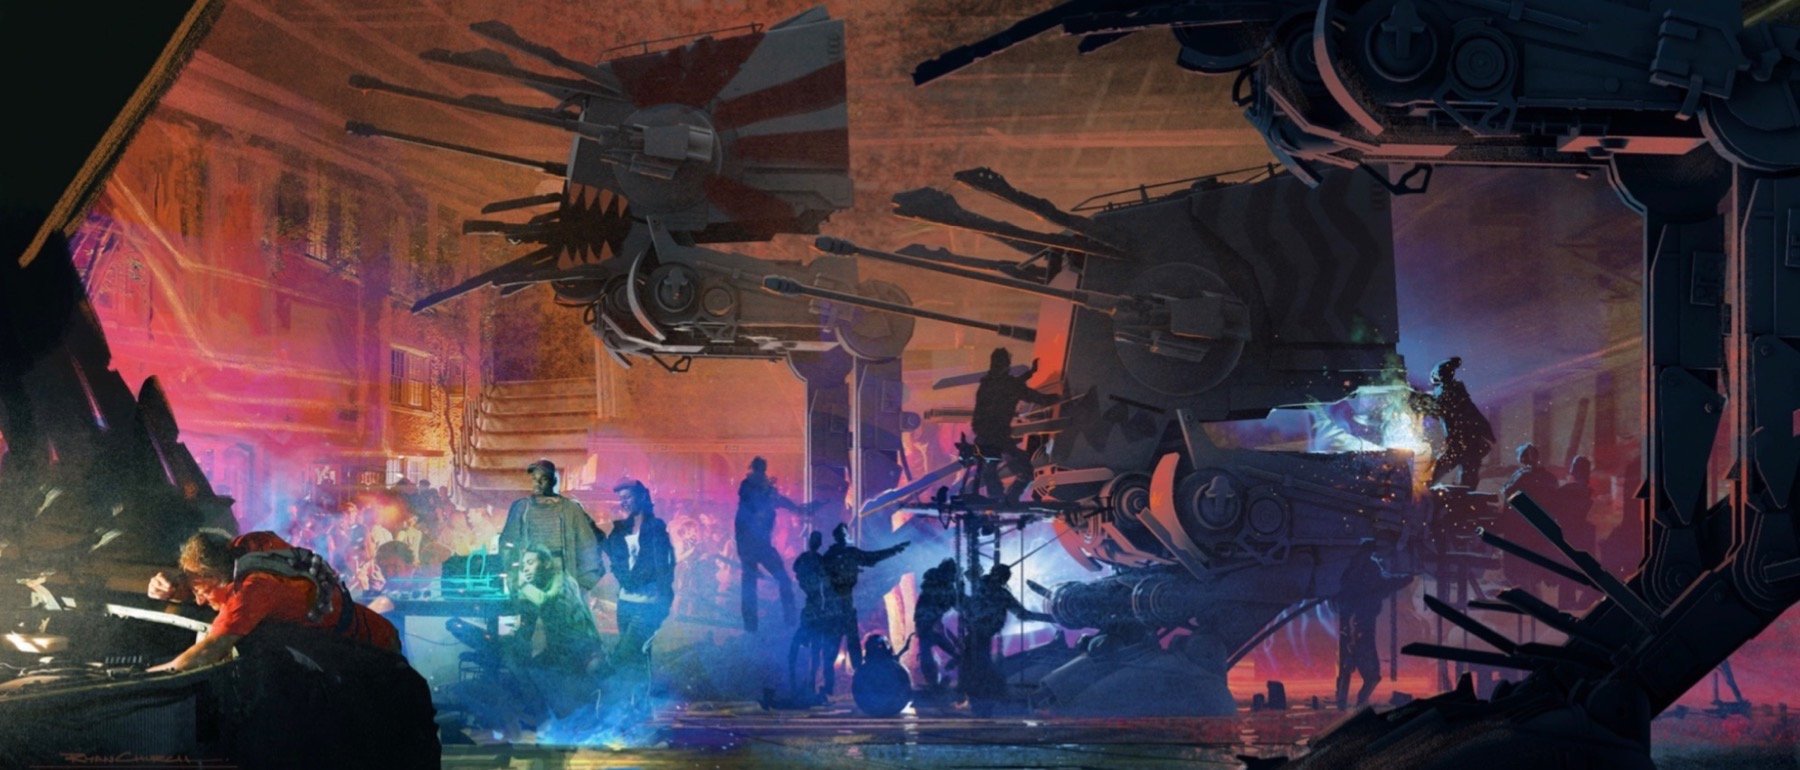 https://www.starwars-universe.com/images/actualites/episode9/conceptarts_trevorrow/13.jpg